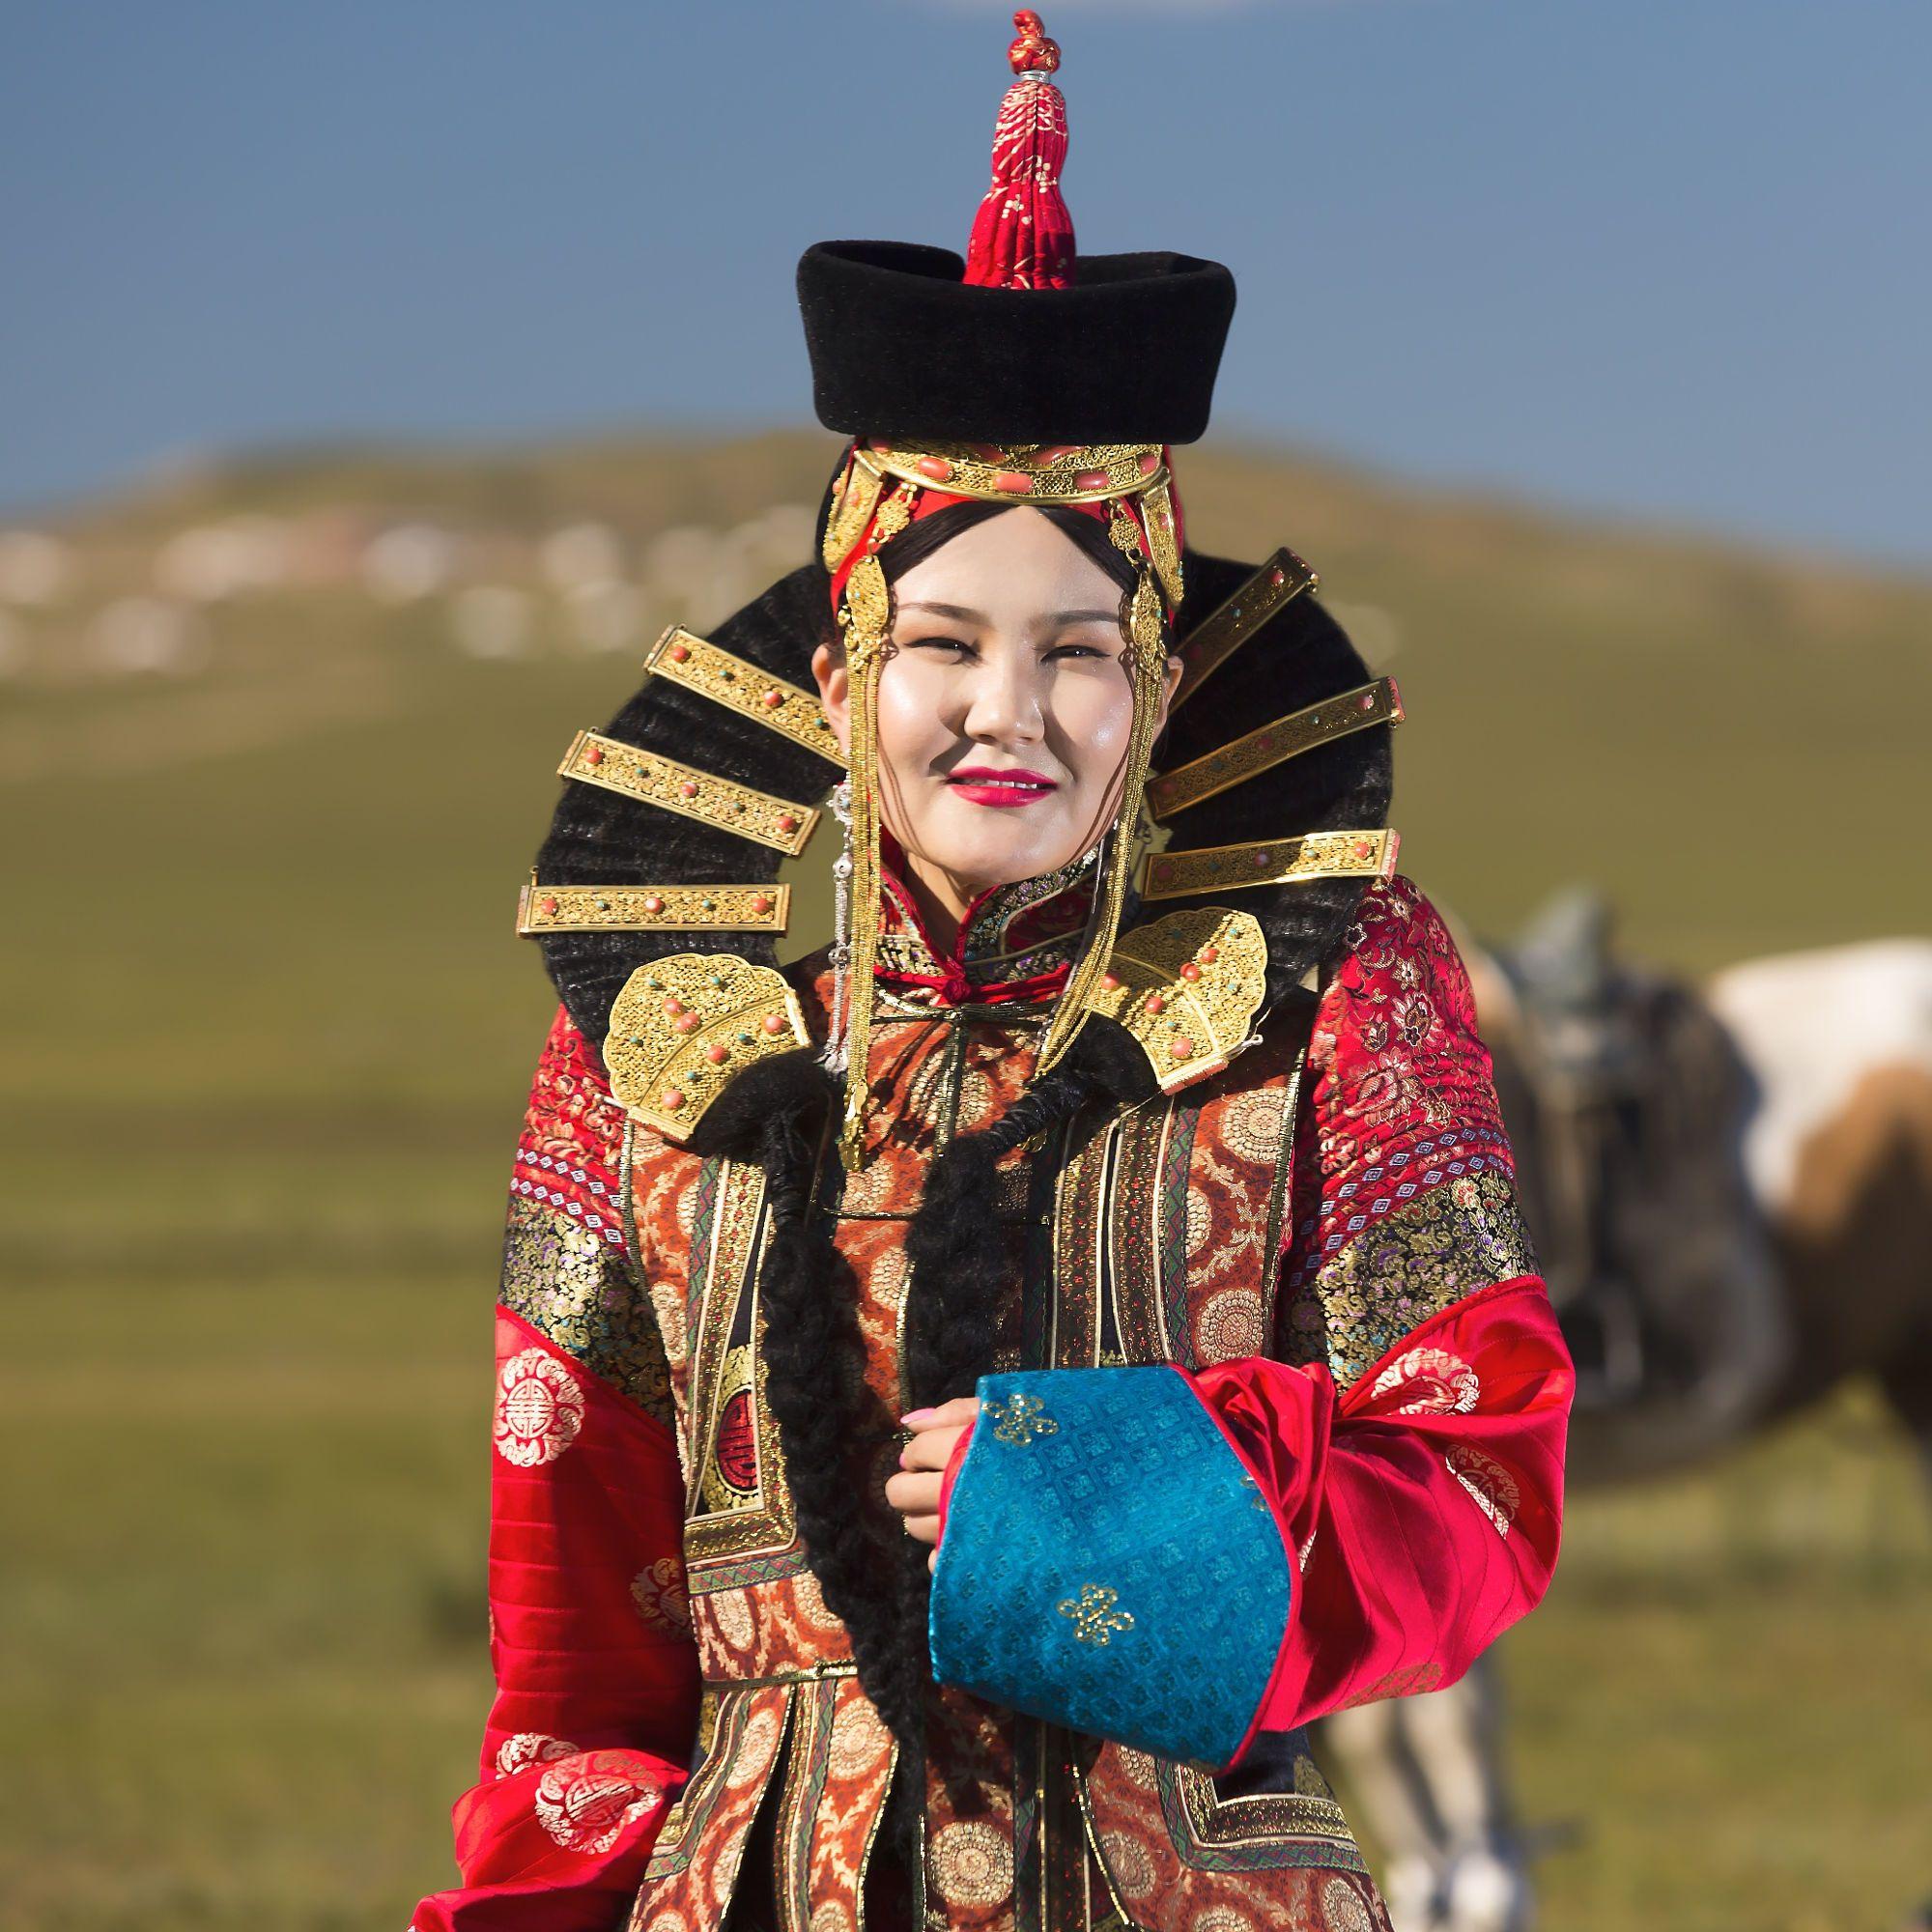 mongolian-women-beach-pakistani-vagina-xxx